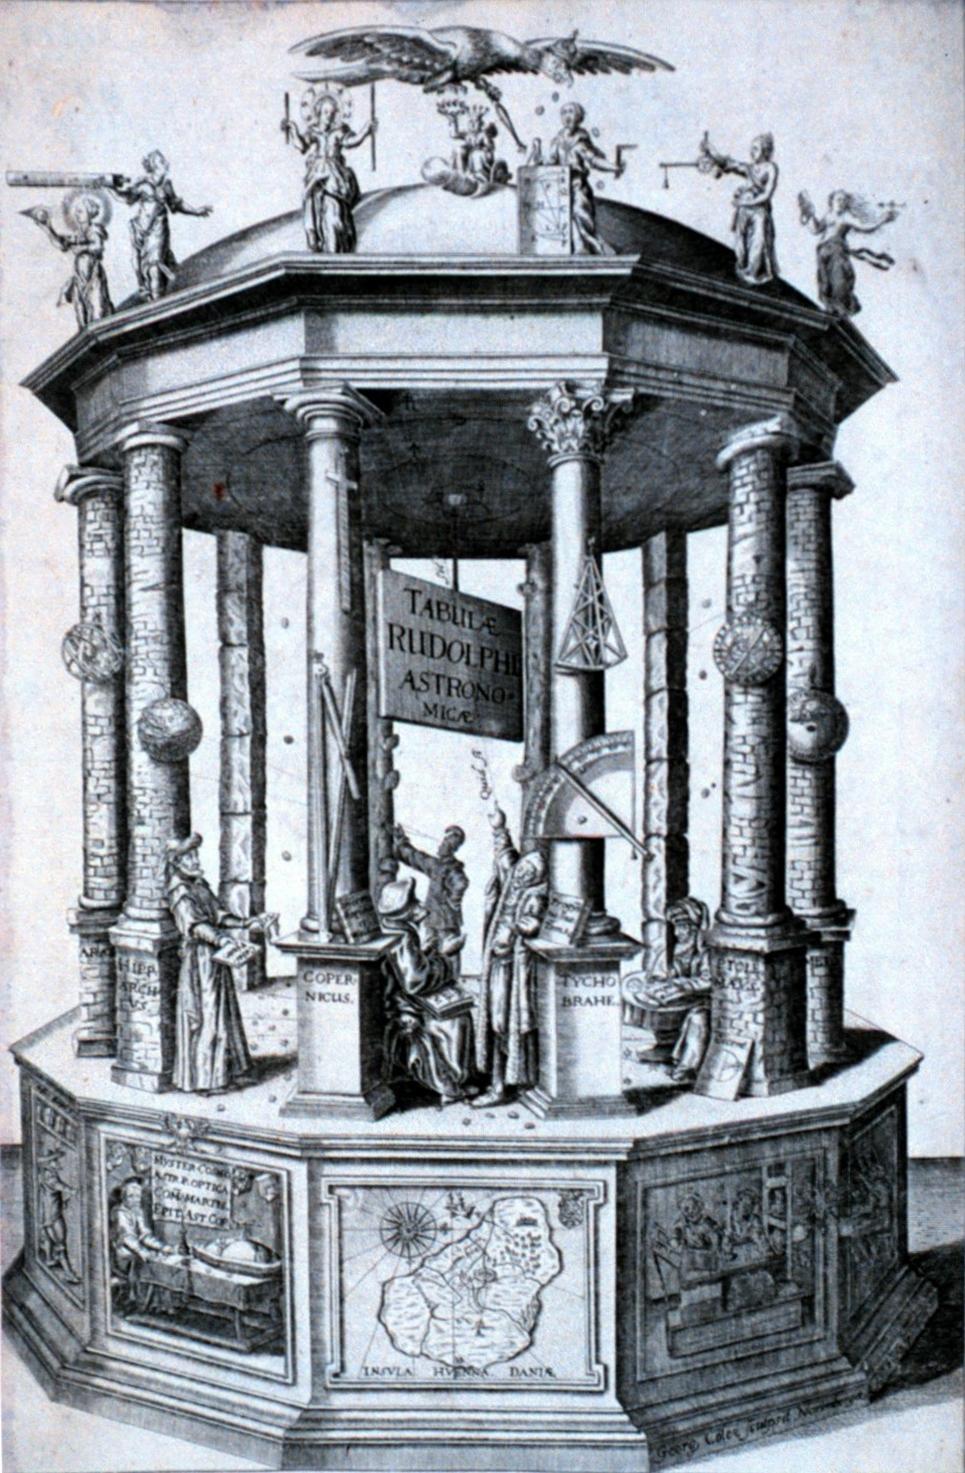 the essay depicts the scientific revolution